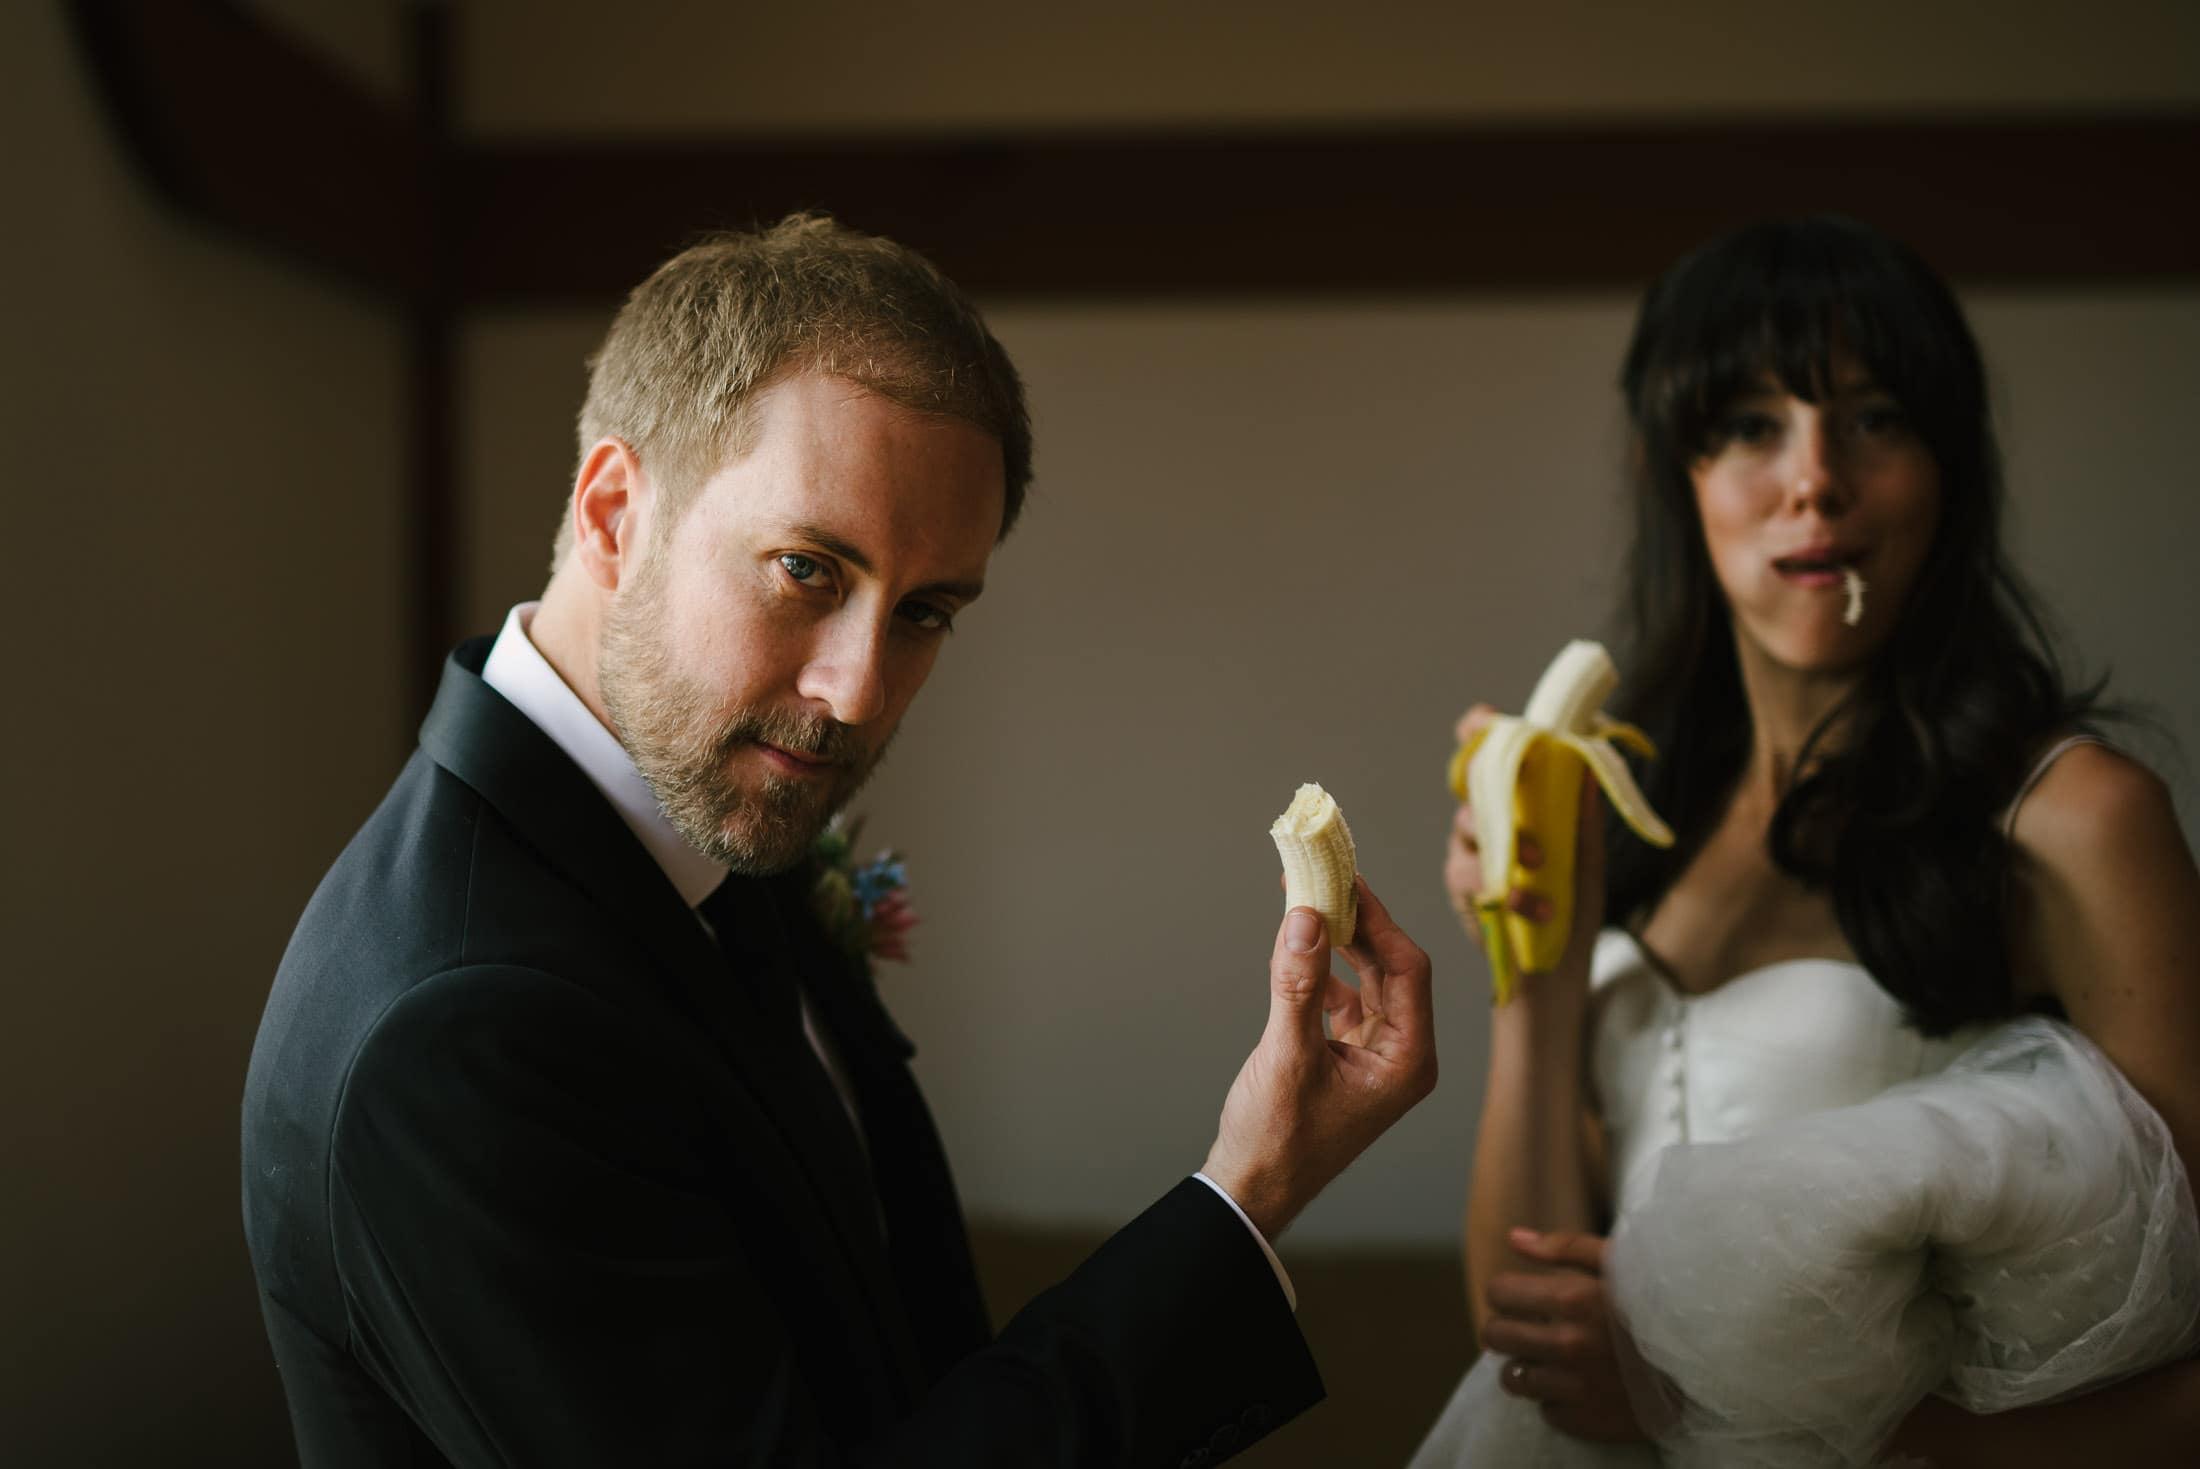 fun goofy picture of bolinas wedding couple